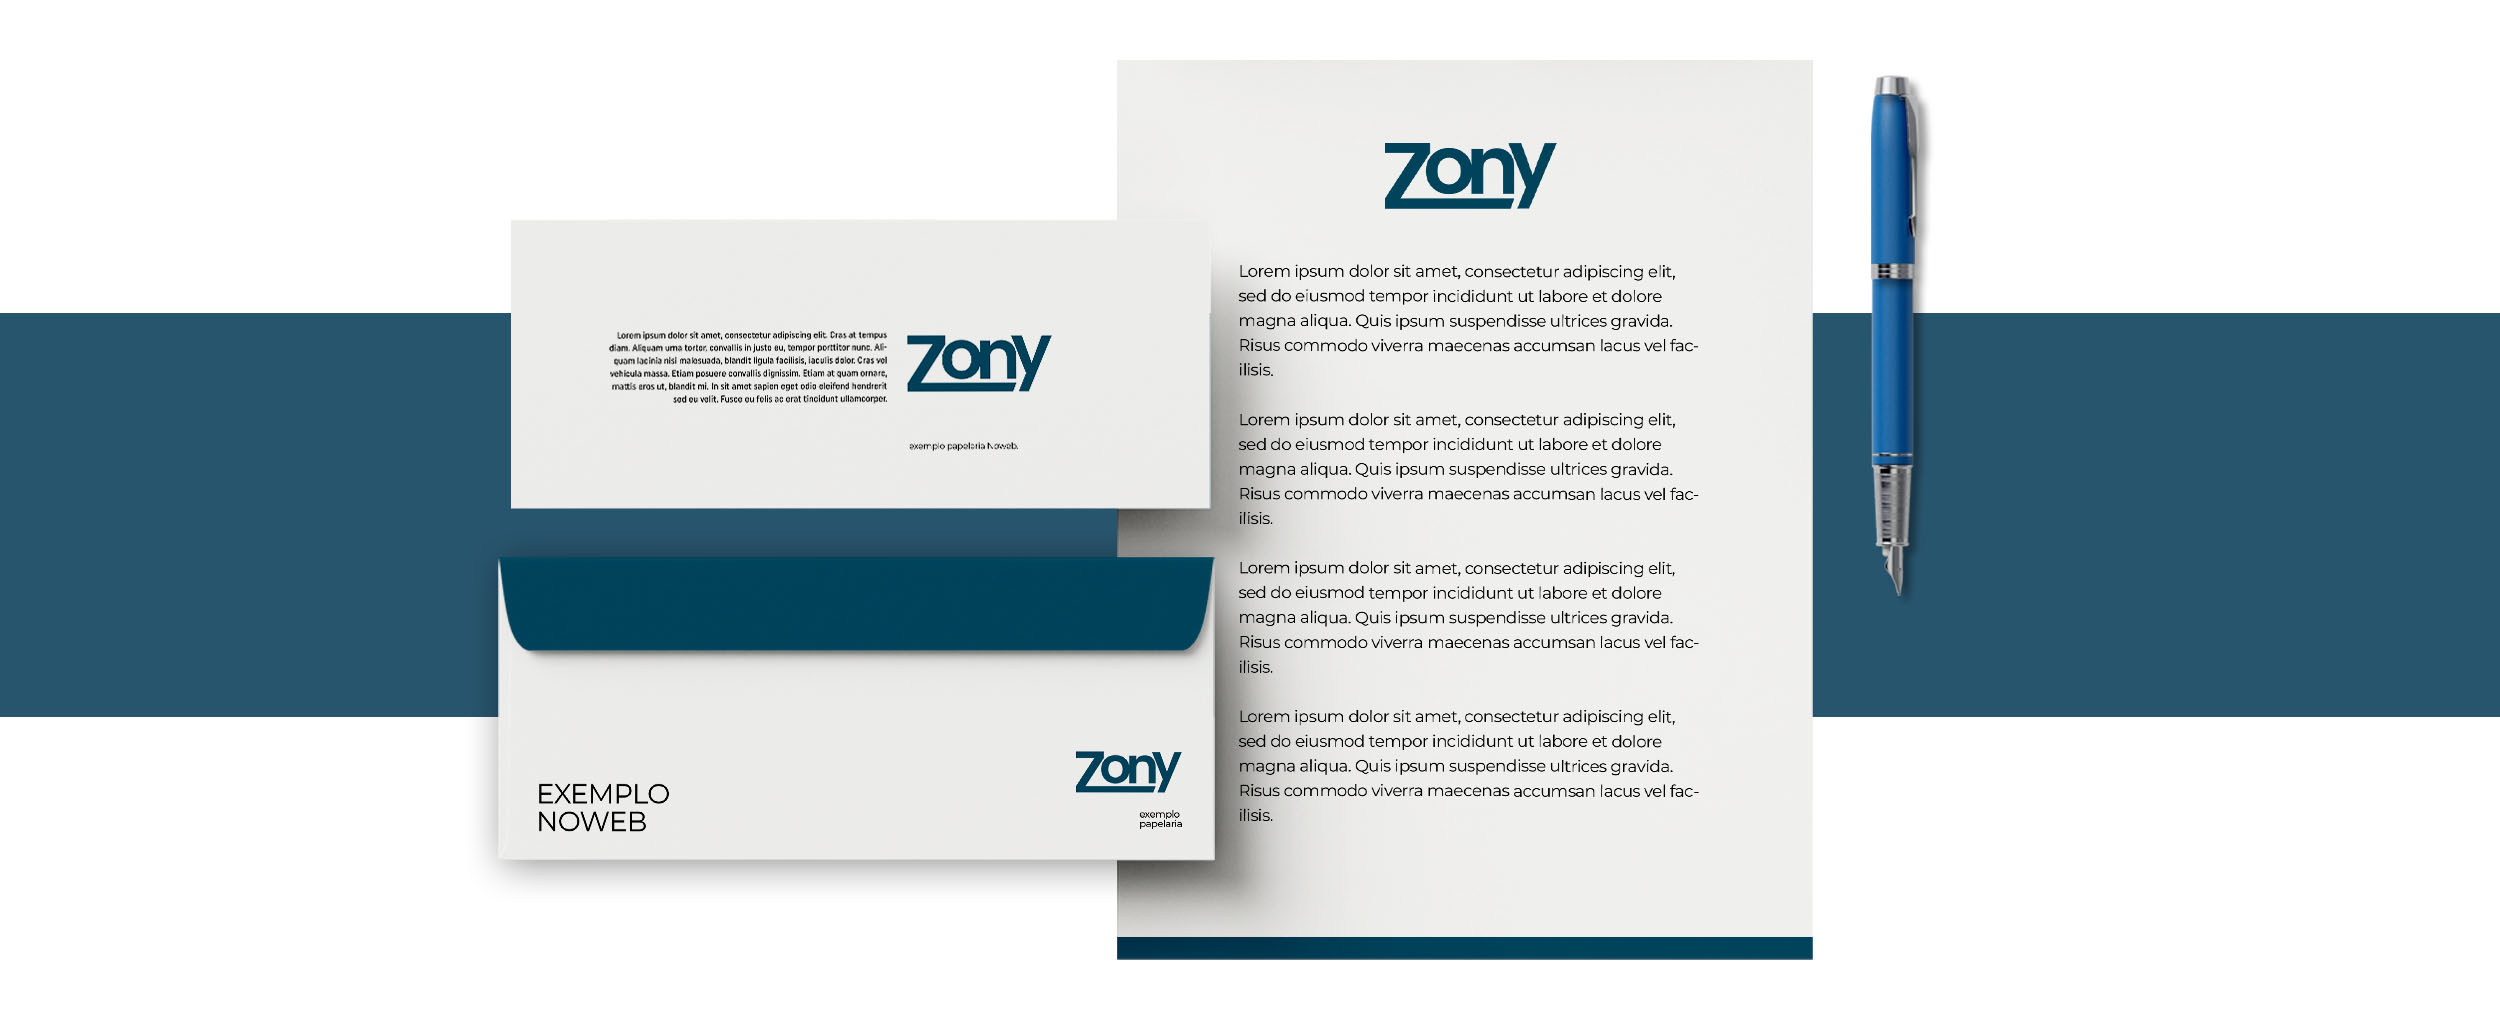 <p><span>Zony</span></p>